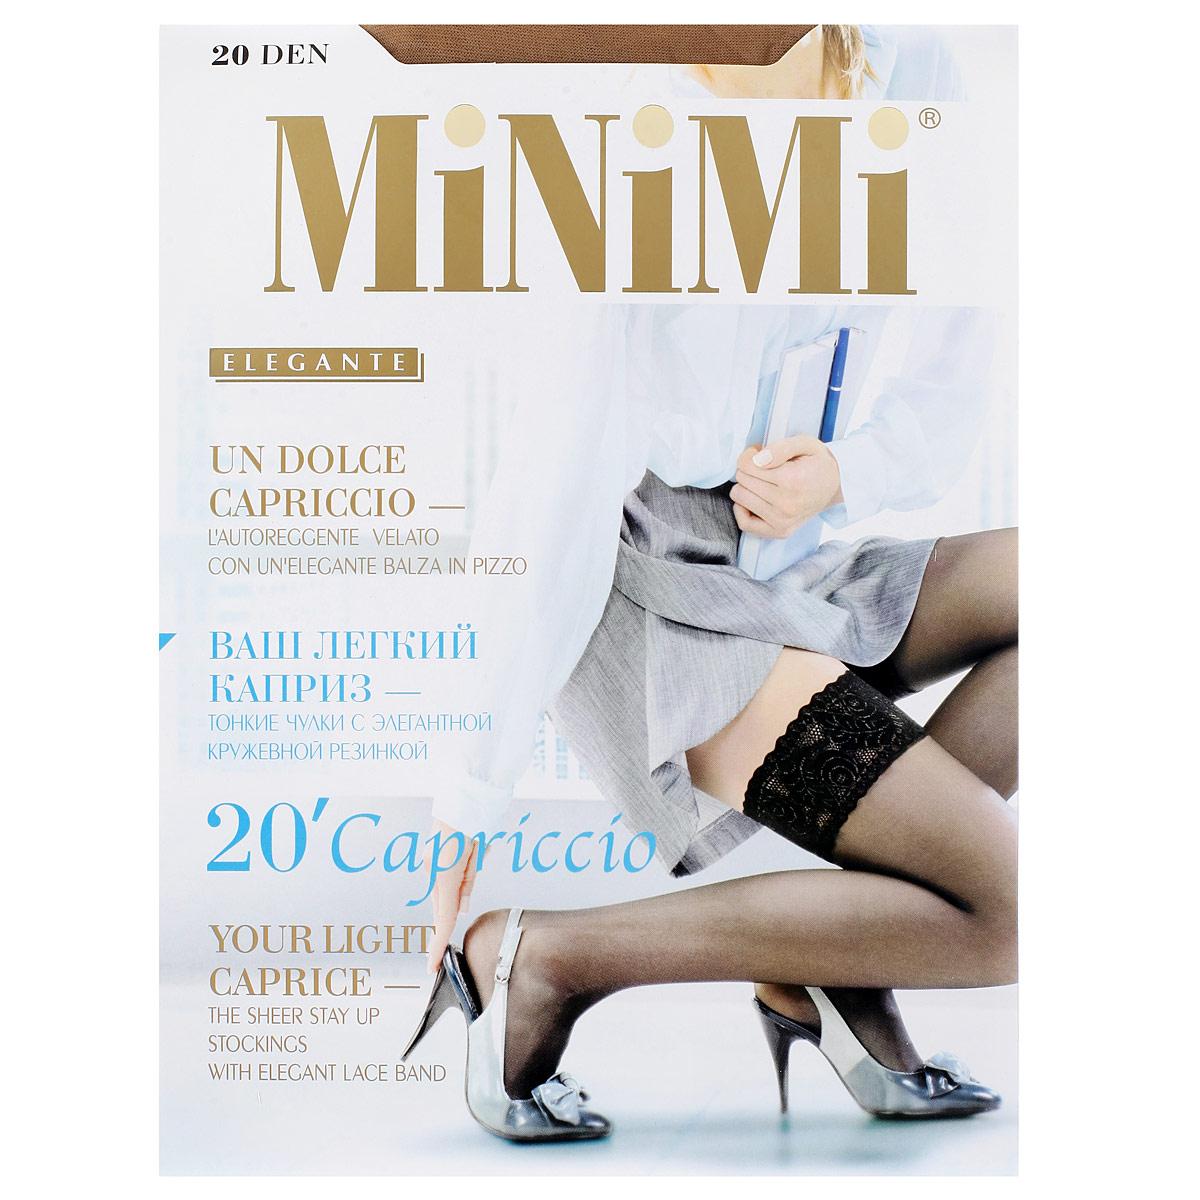 Чулки Minimi Capriccio 20, цвет: Daino (загар). Размер 4 (L/XL) чулки minimi capriccio 20 цвет caramello карамельный размер 4 l xl